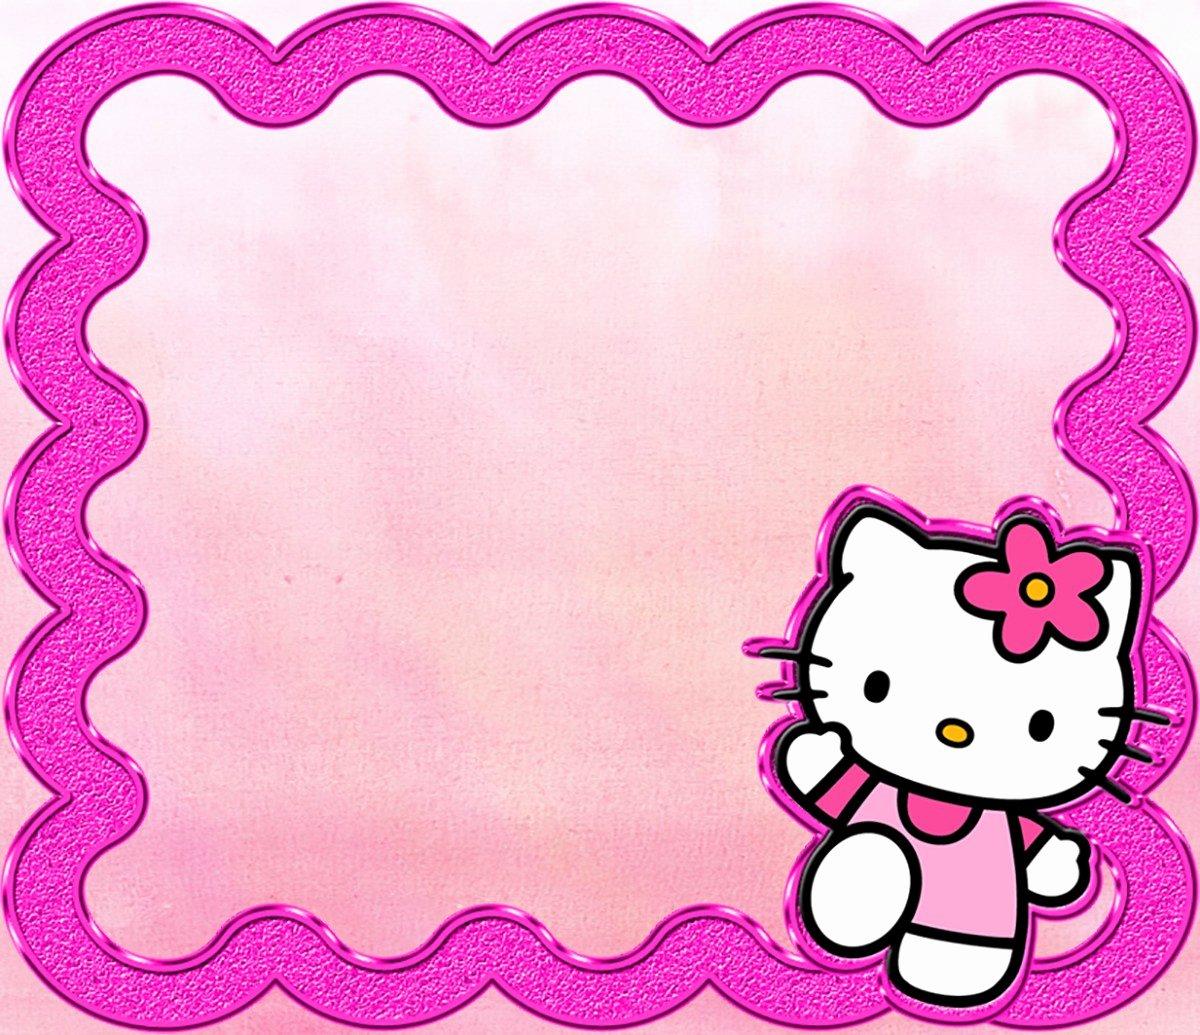 Hello Kitty Invite Template Lovely Hello Kitty Free Printable Invitation Templates